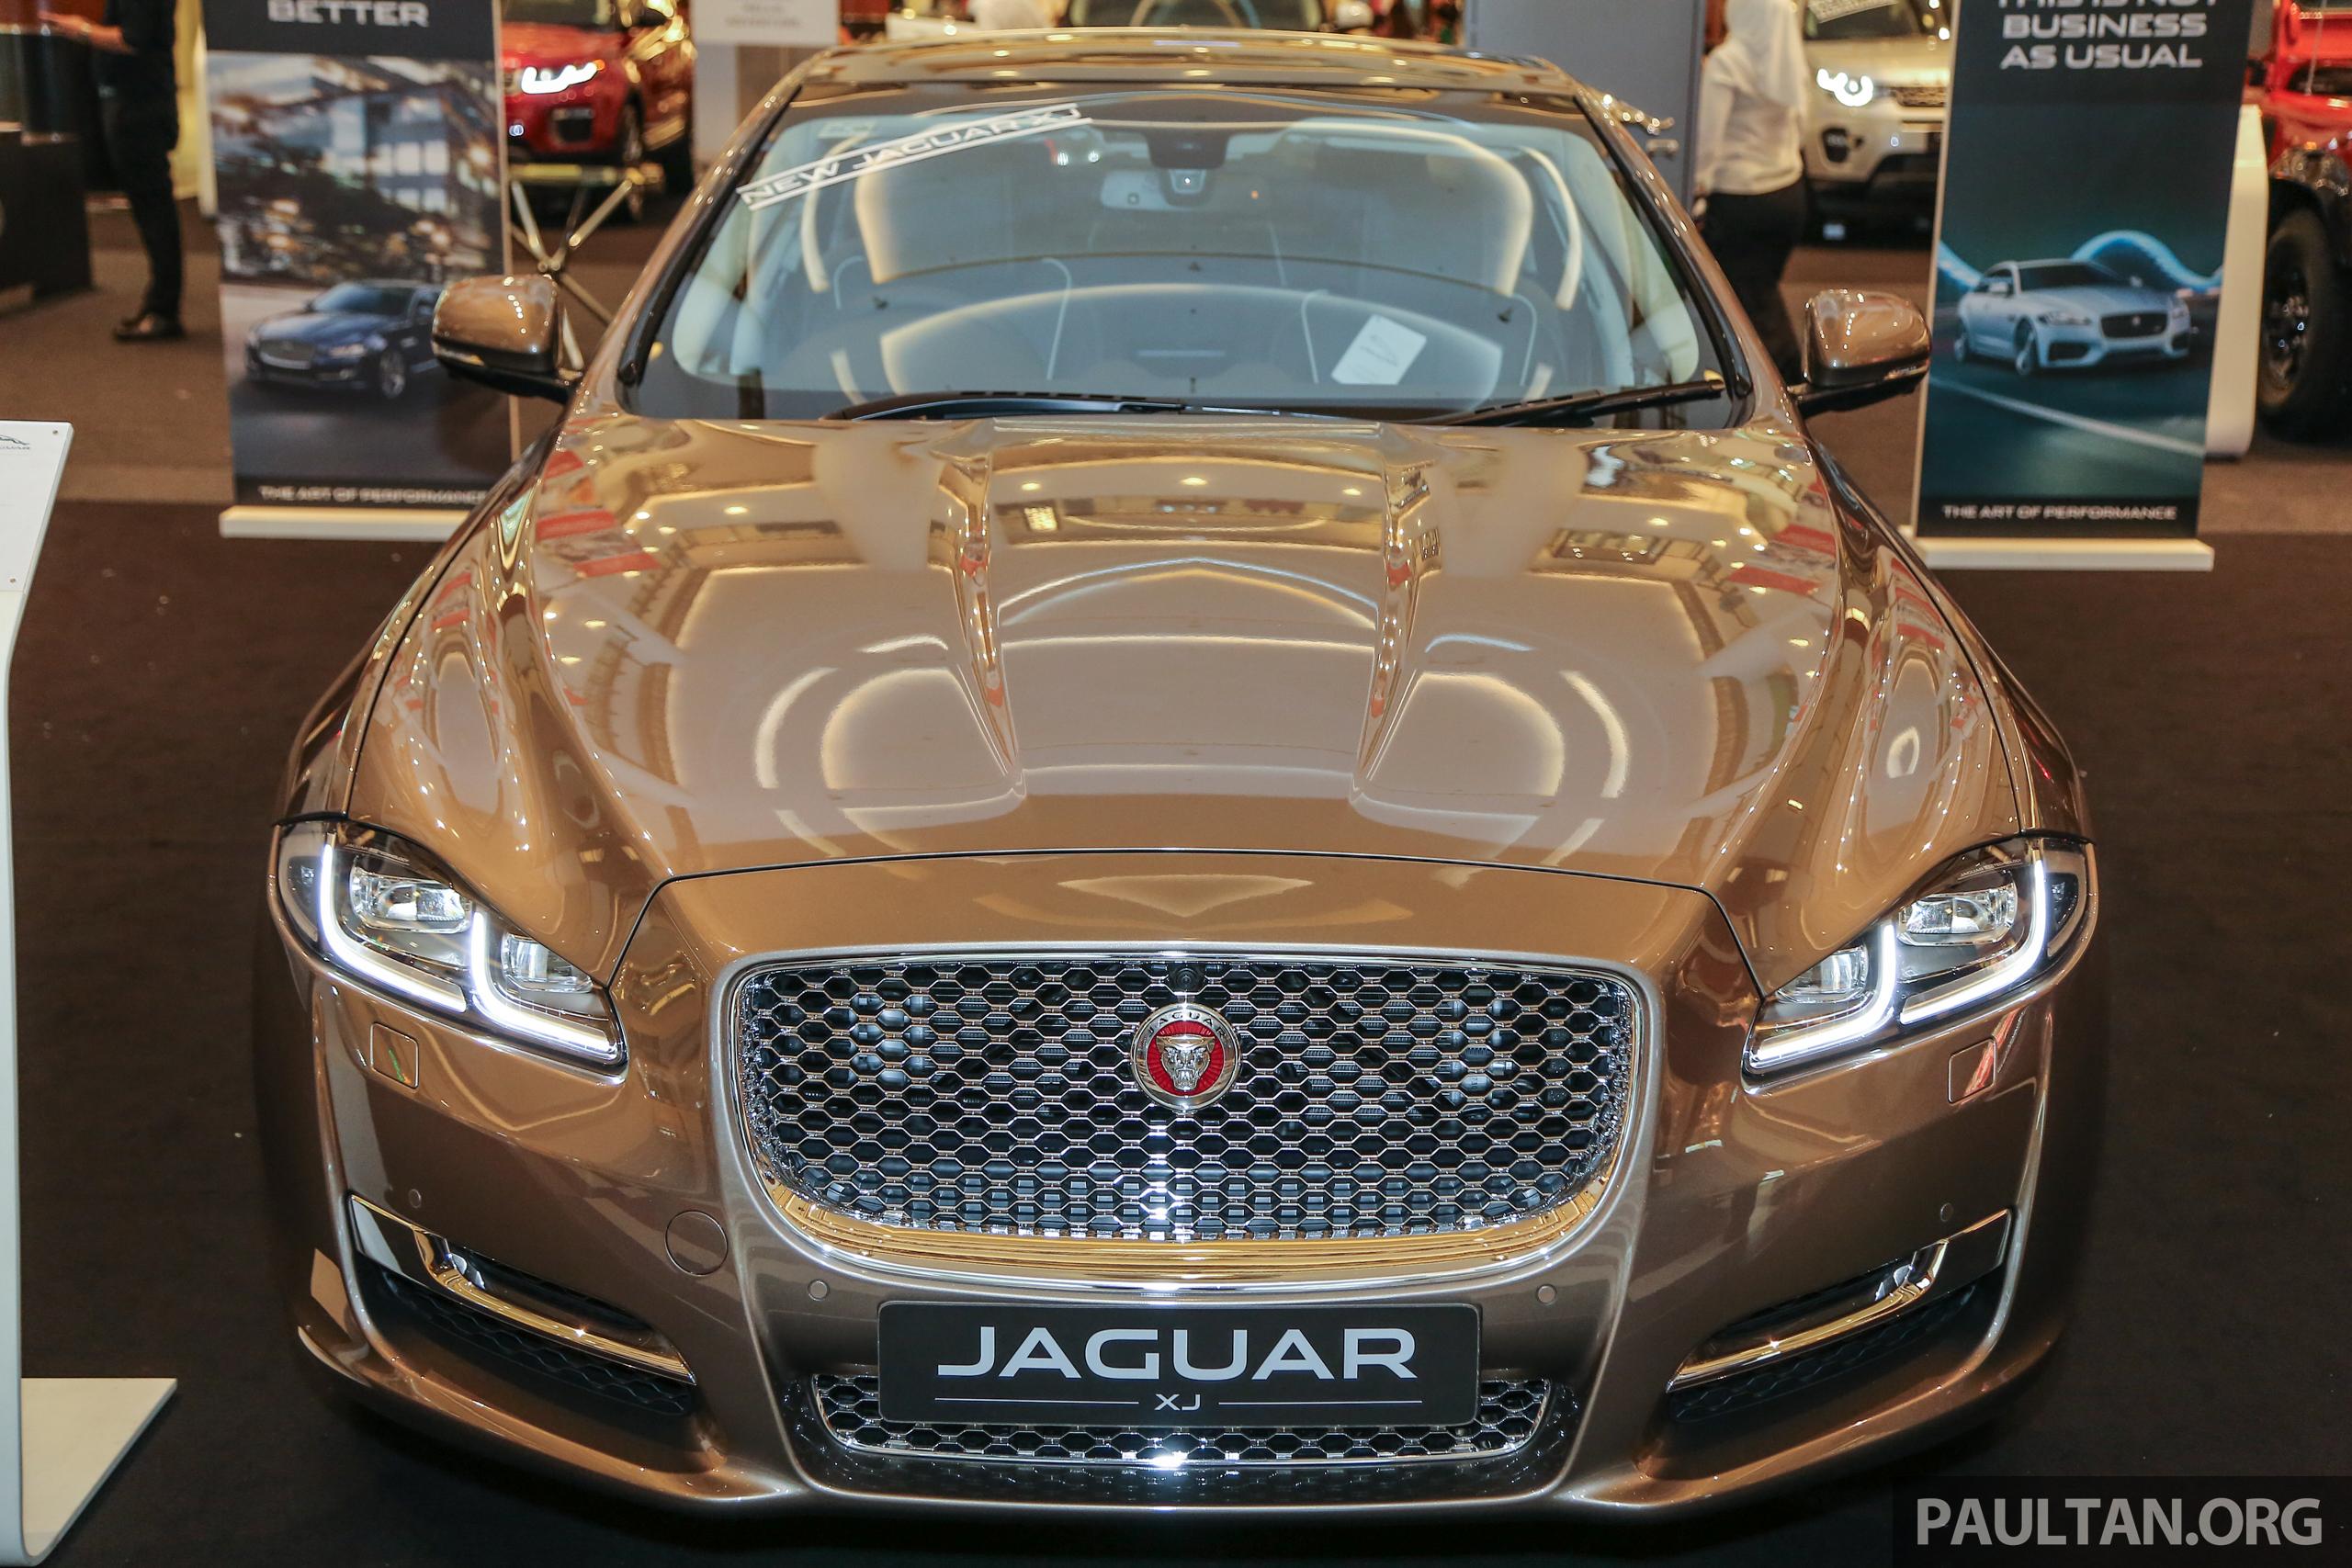 Jaguar 2018 Xj >> Jaguar XJ L 2.0 Ti facelift on display at BSC – RM703k Paul Tan - Image 499749